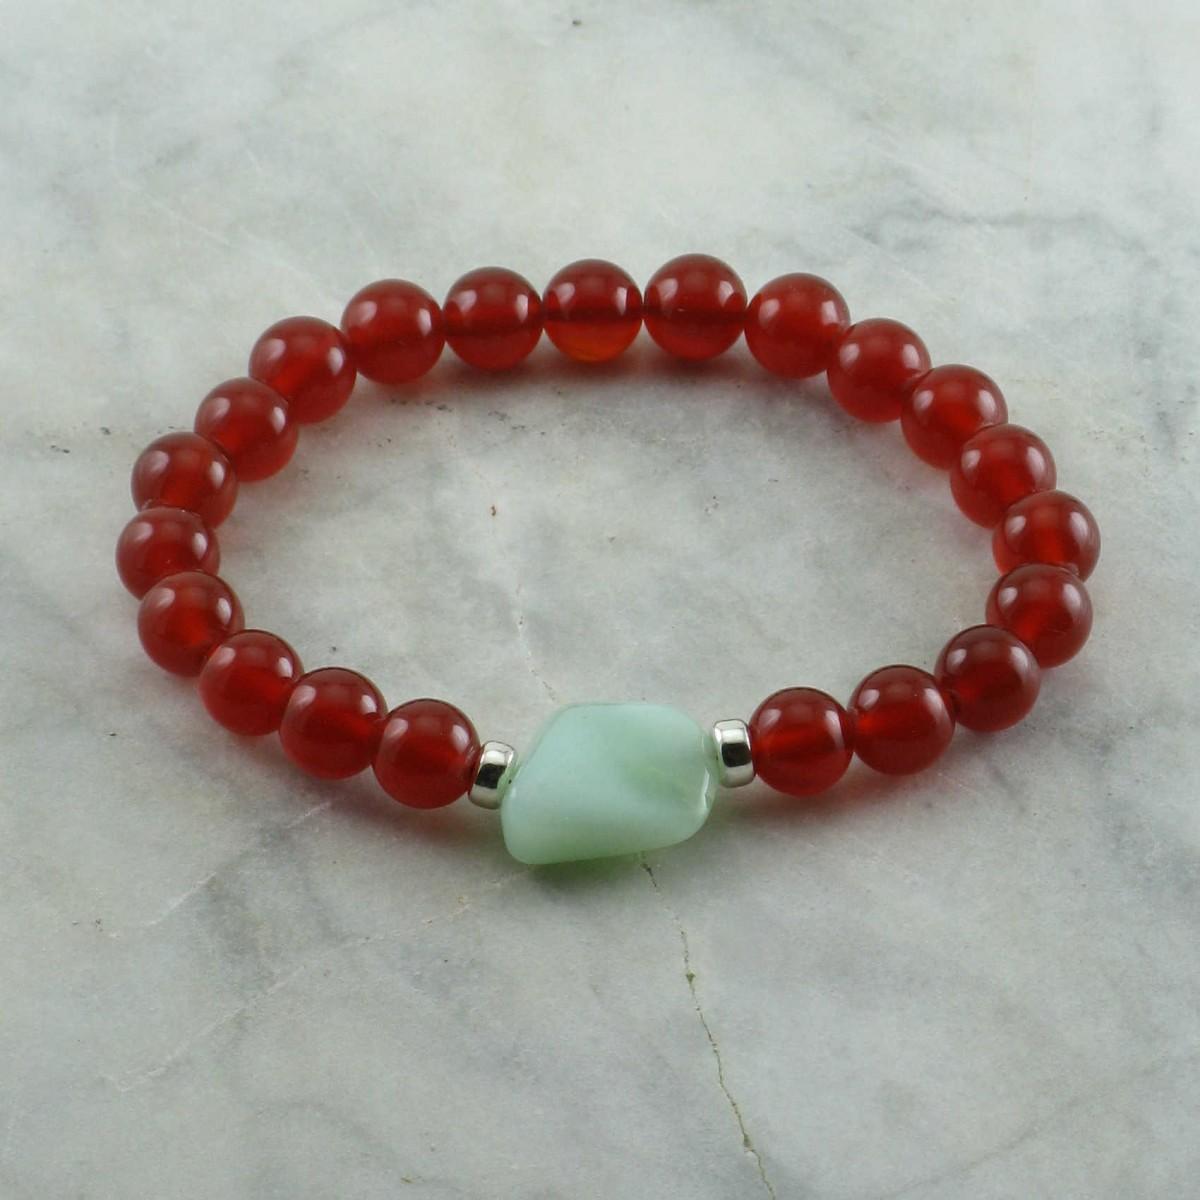 Healing_Mala_Bracelet_21_Carnelian_Mala_Beads_Buddhist_Bracelet